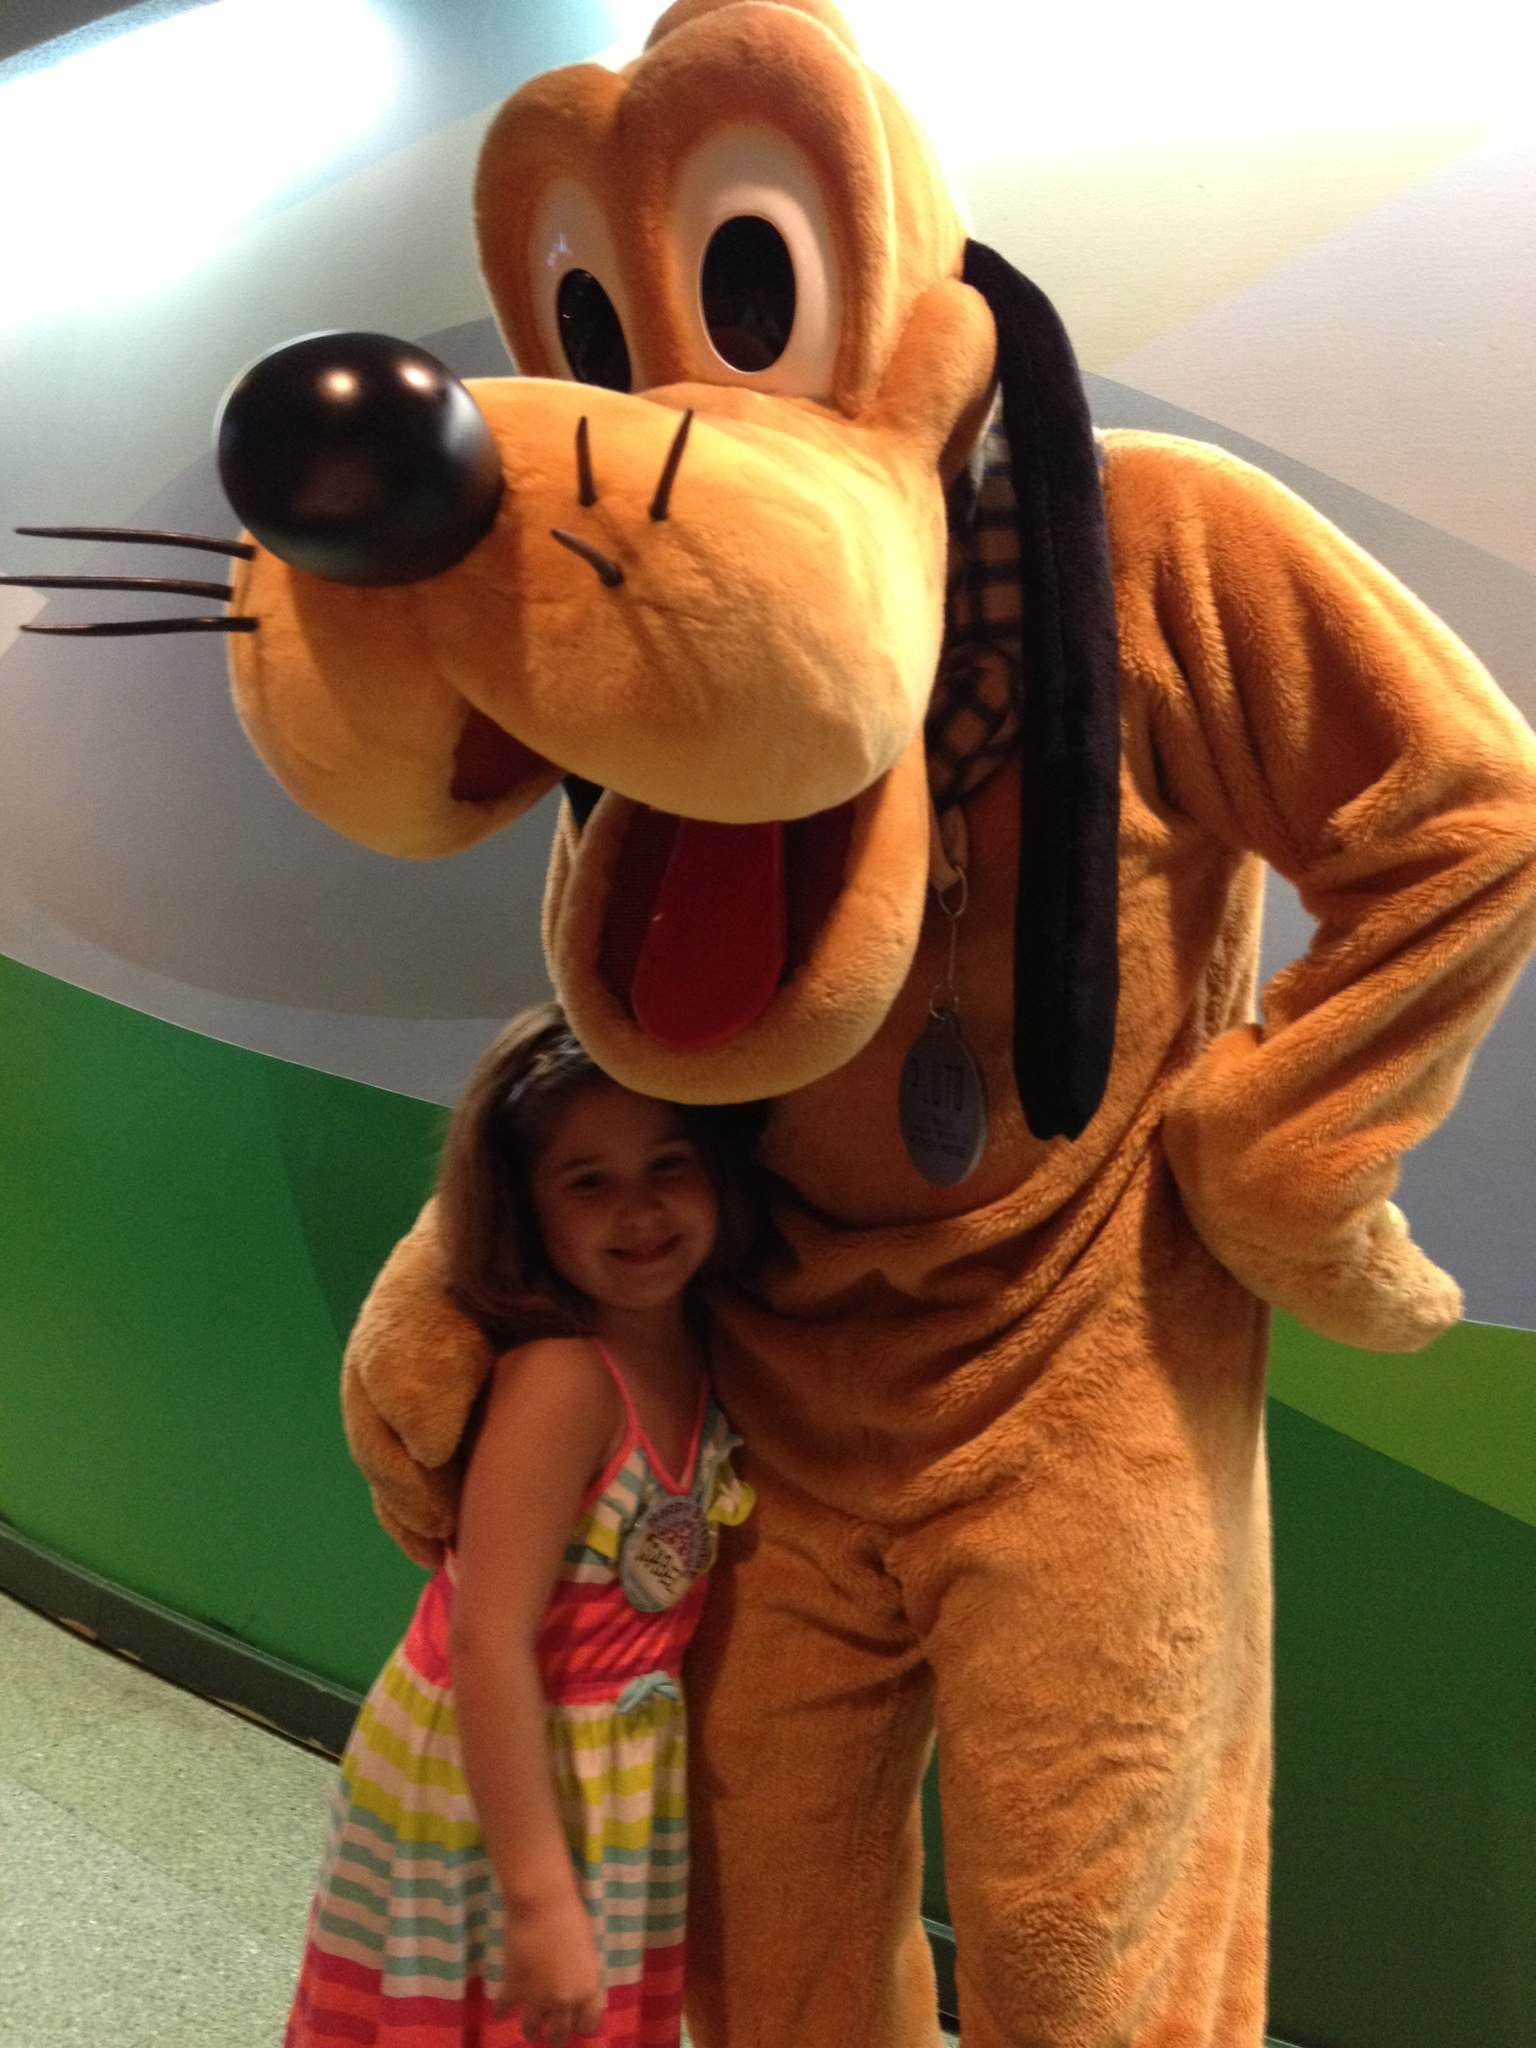 Fun with Pluto